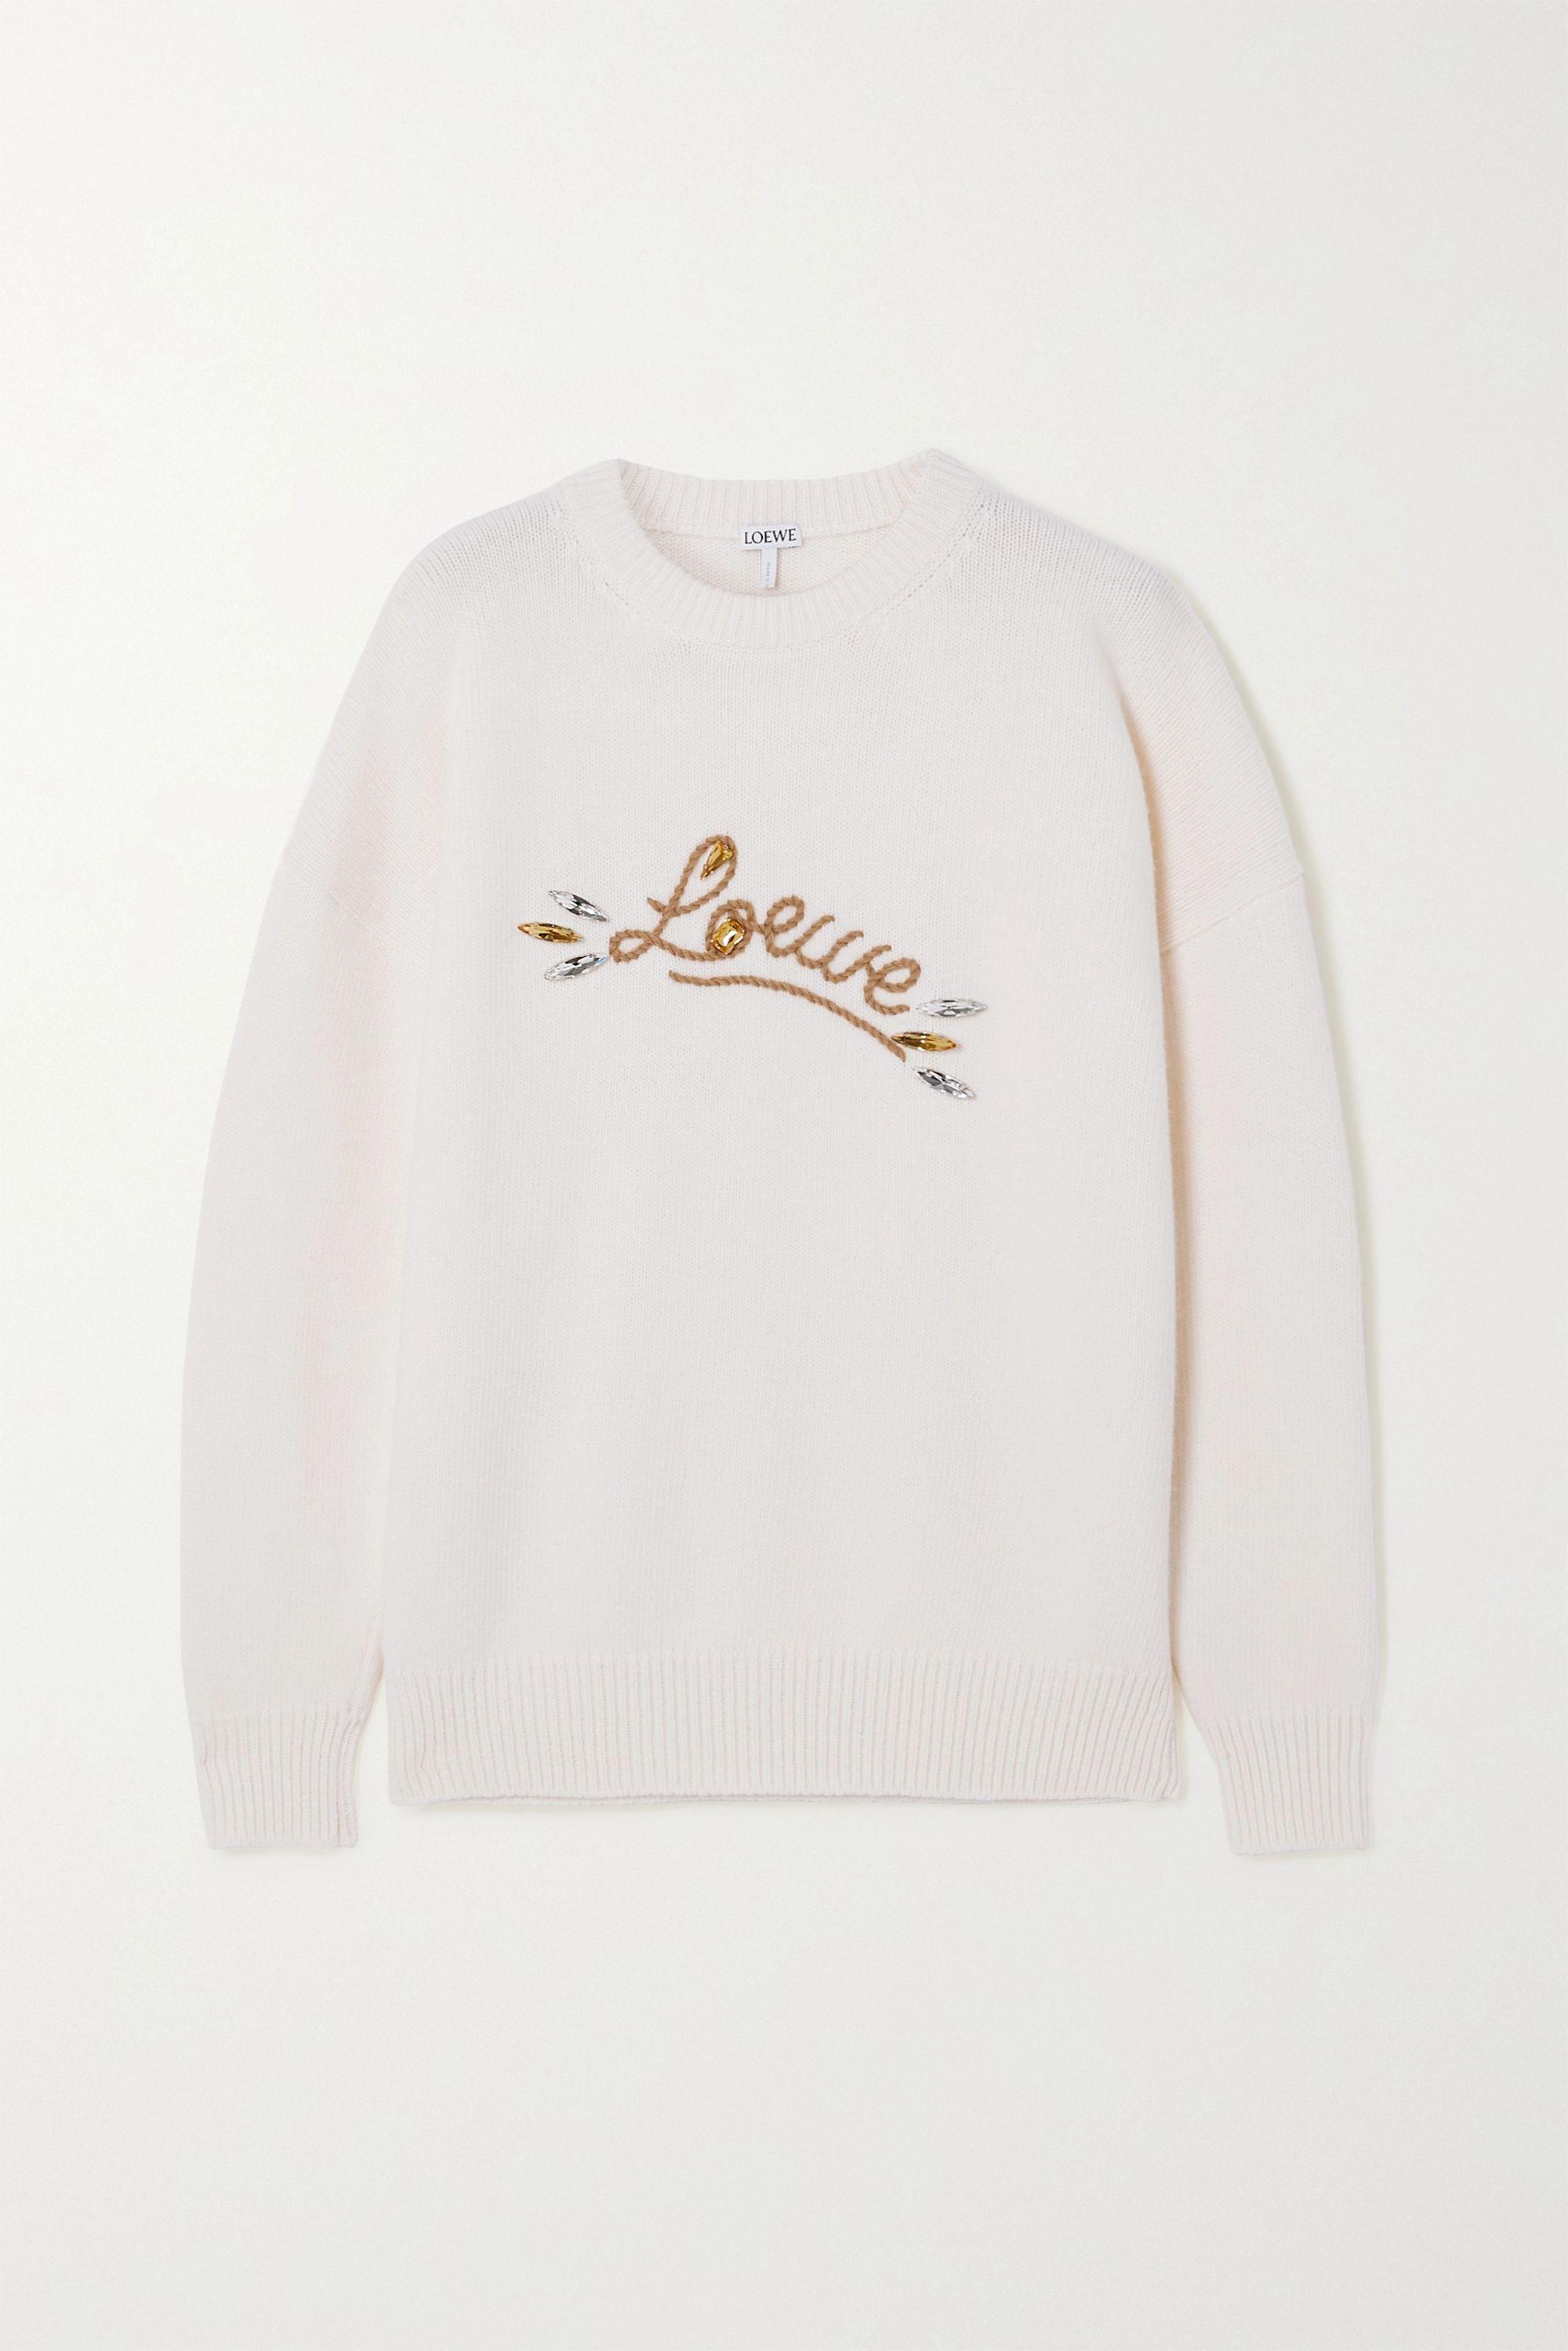 Loewe Crystal-embellished embroidered wool sweater